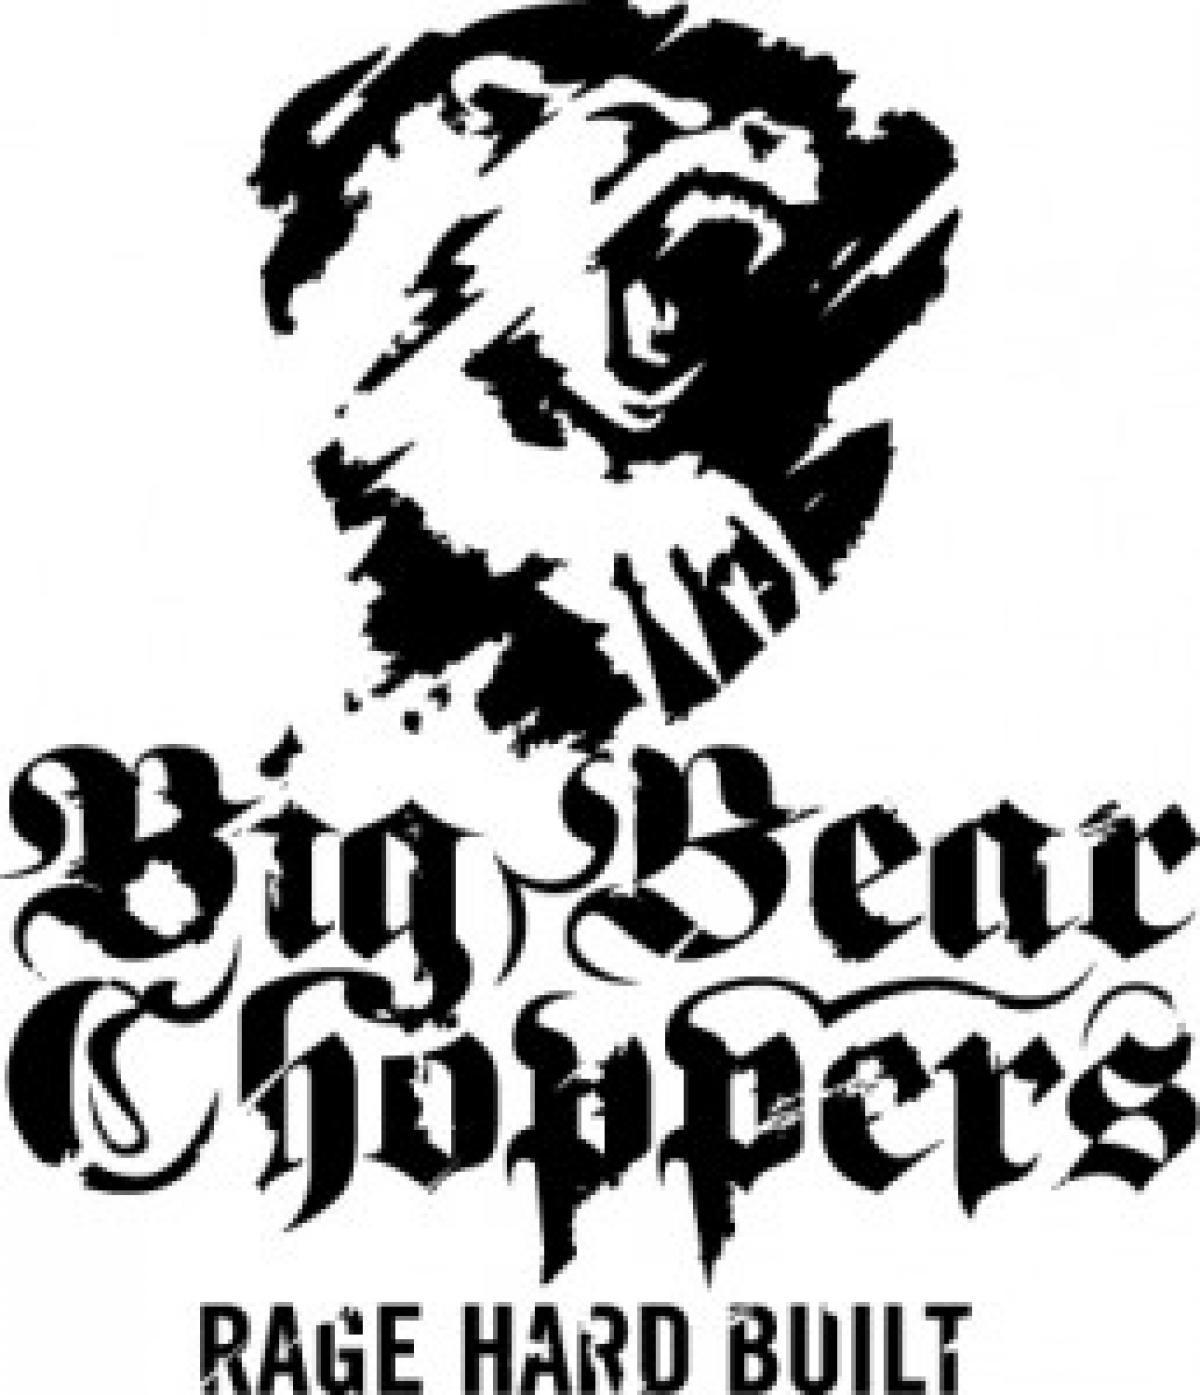 Big Bear Motorcycle Manuals Pdf Wiring Diagrams Fault Codes 03 Dog Diagram